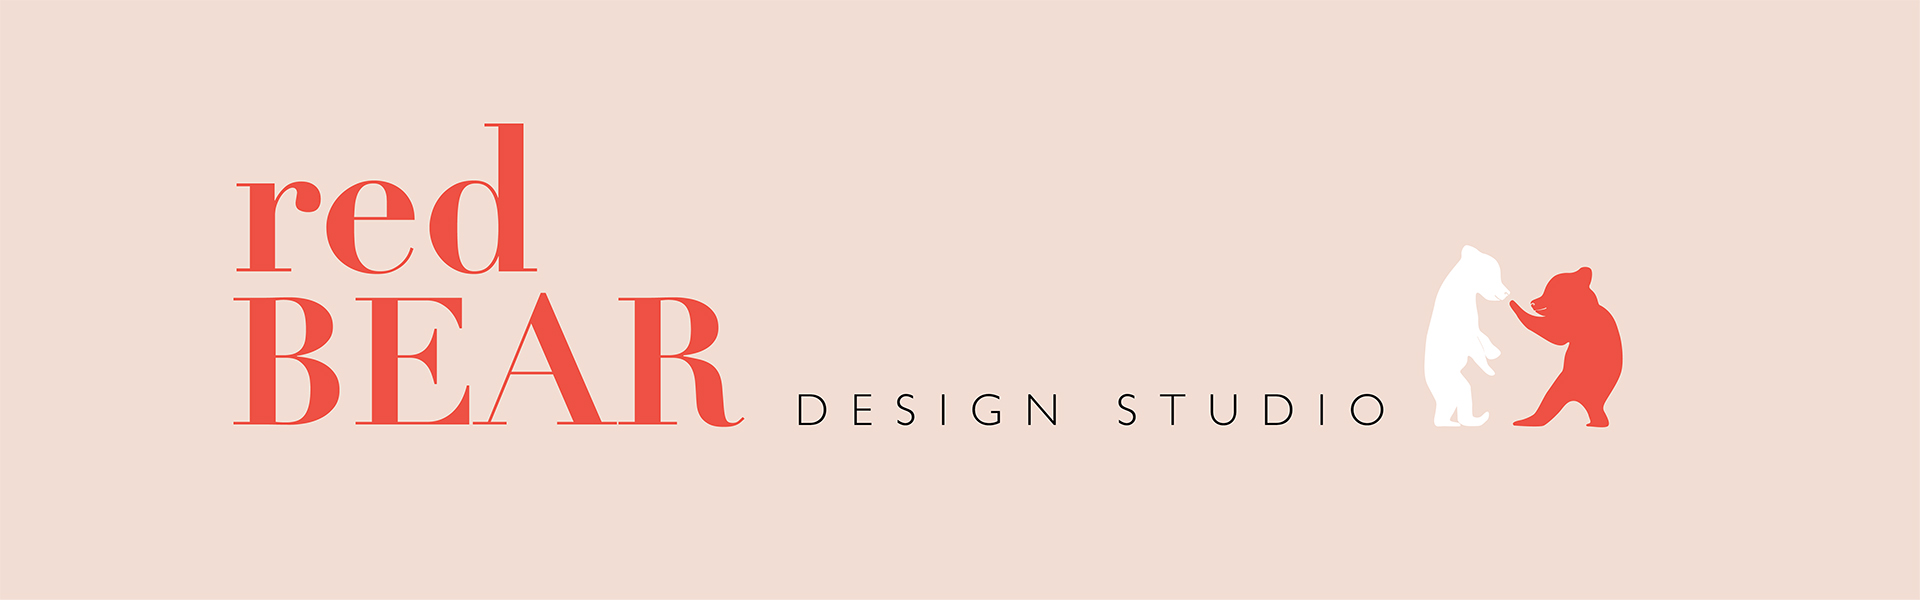 Red Bear Design Studio Hero Banner Mobile_Artboard 2